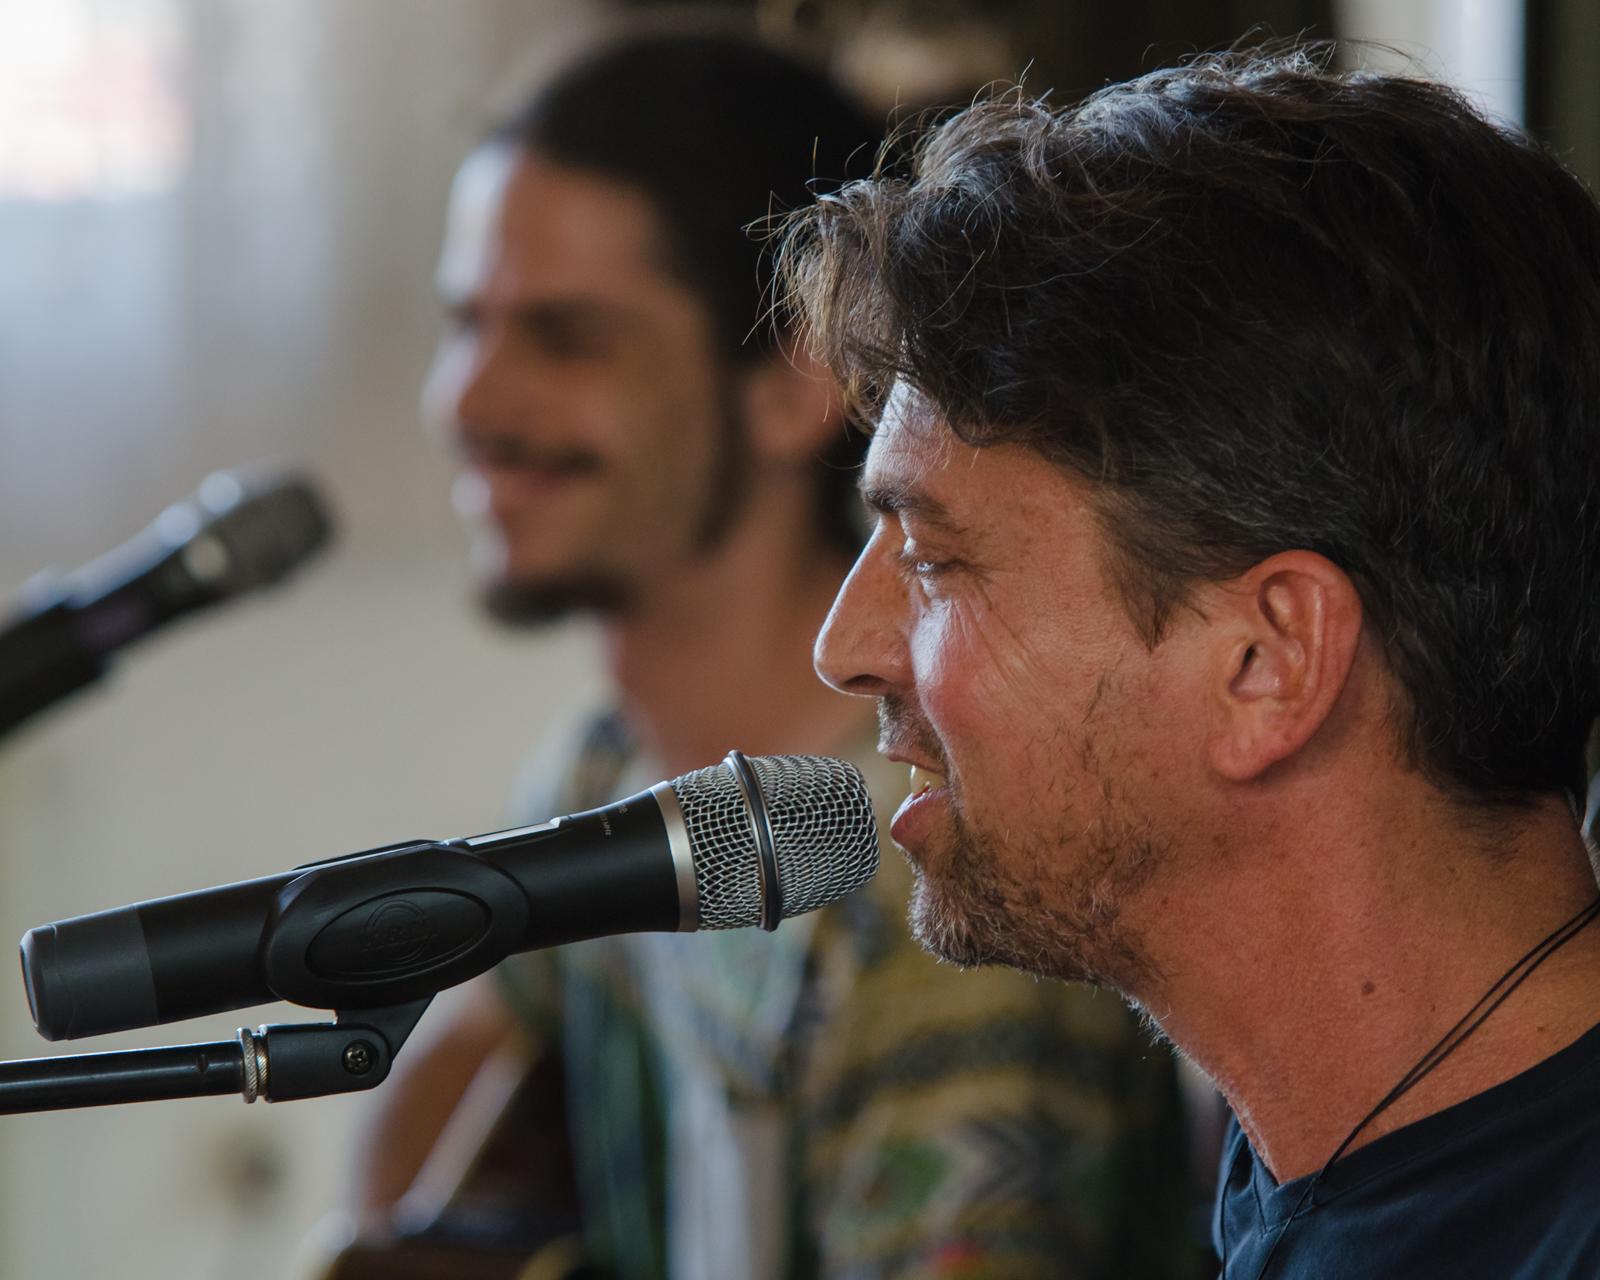 Konzert: Vitis & Strier - Indie-Folkrock aus Israel